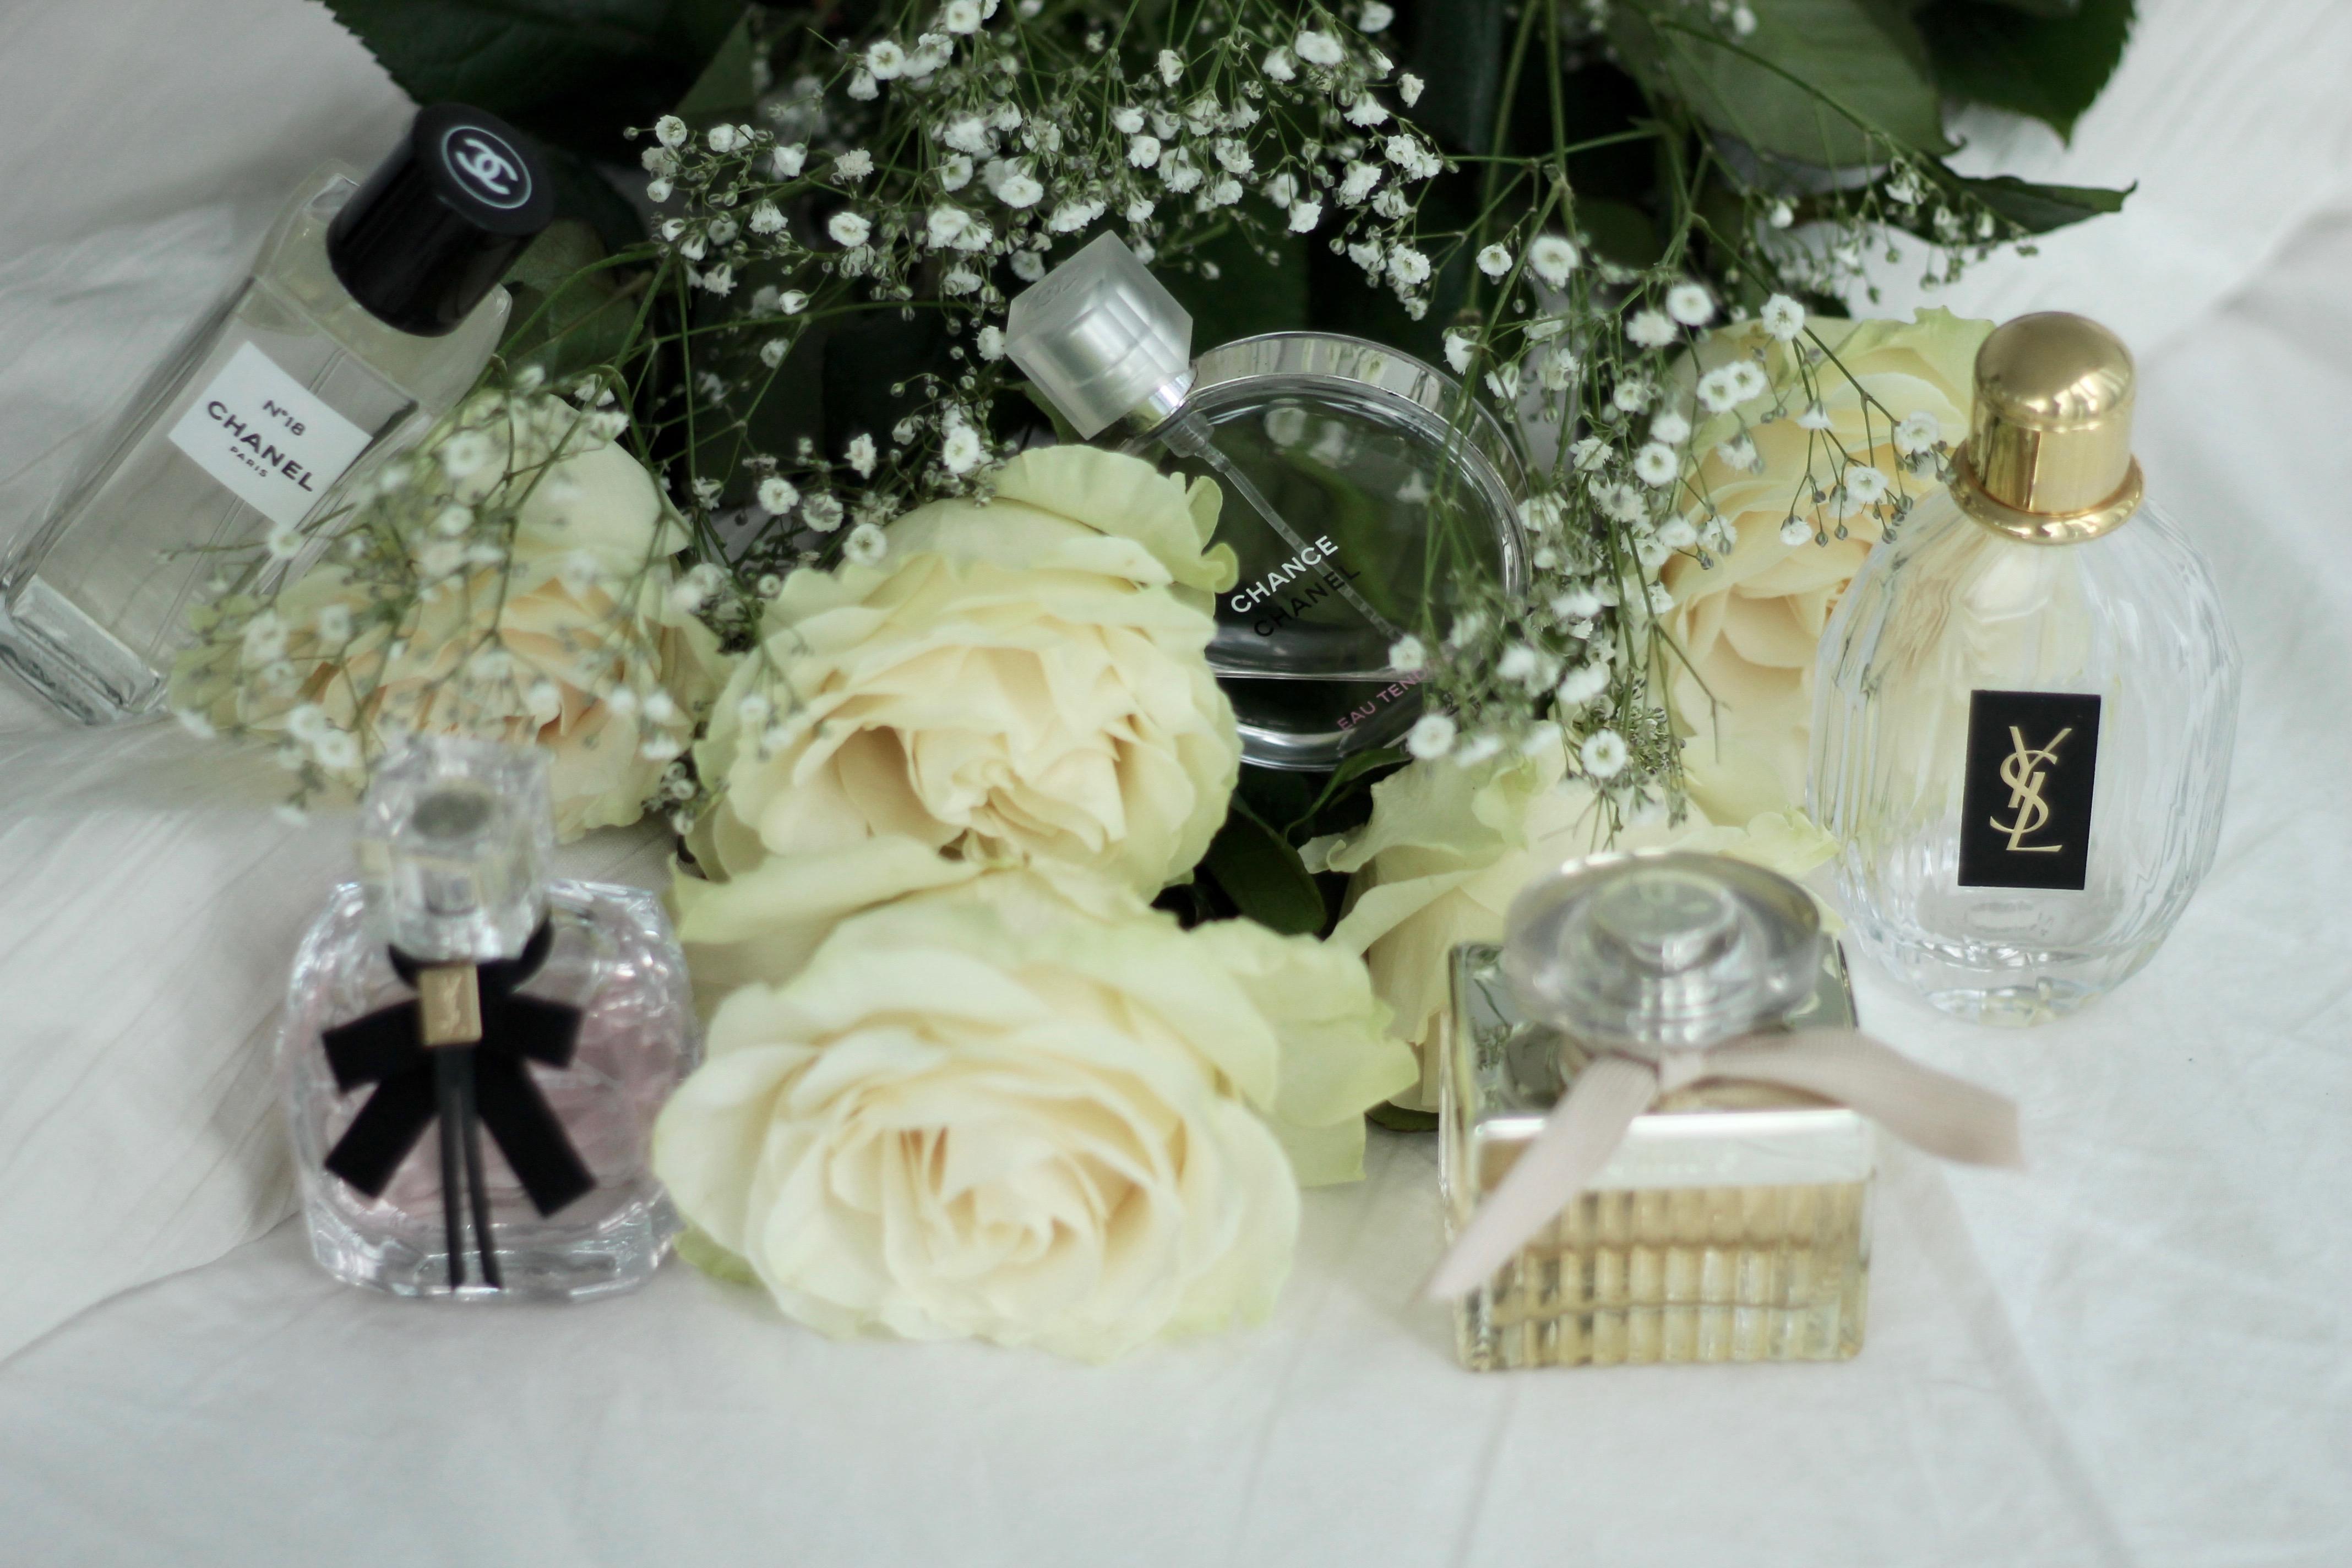 MON MODE Blog | Mon Mode | Fashion Blog | Toronto Blogger | Luxury Fragrances | YSL Beauty | Chloe | Chanel Beauty | Luxury French Fragrances